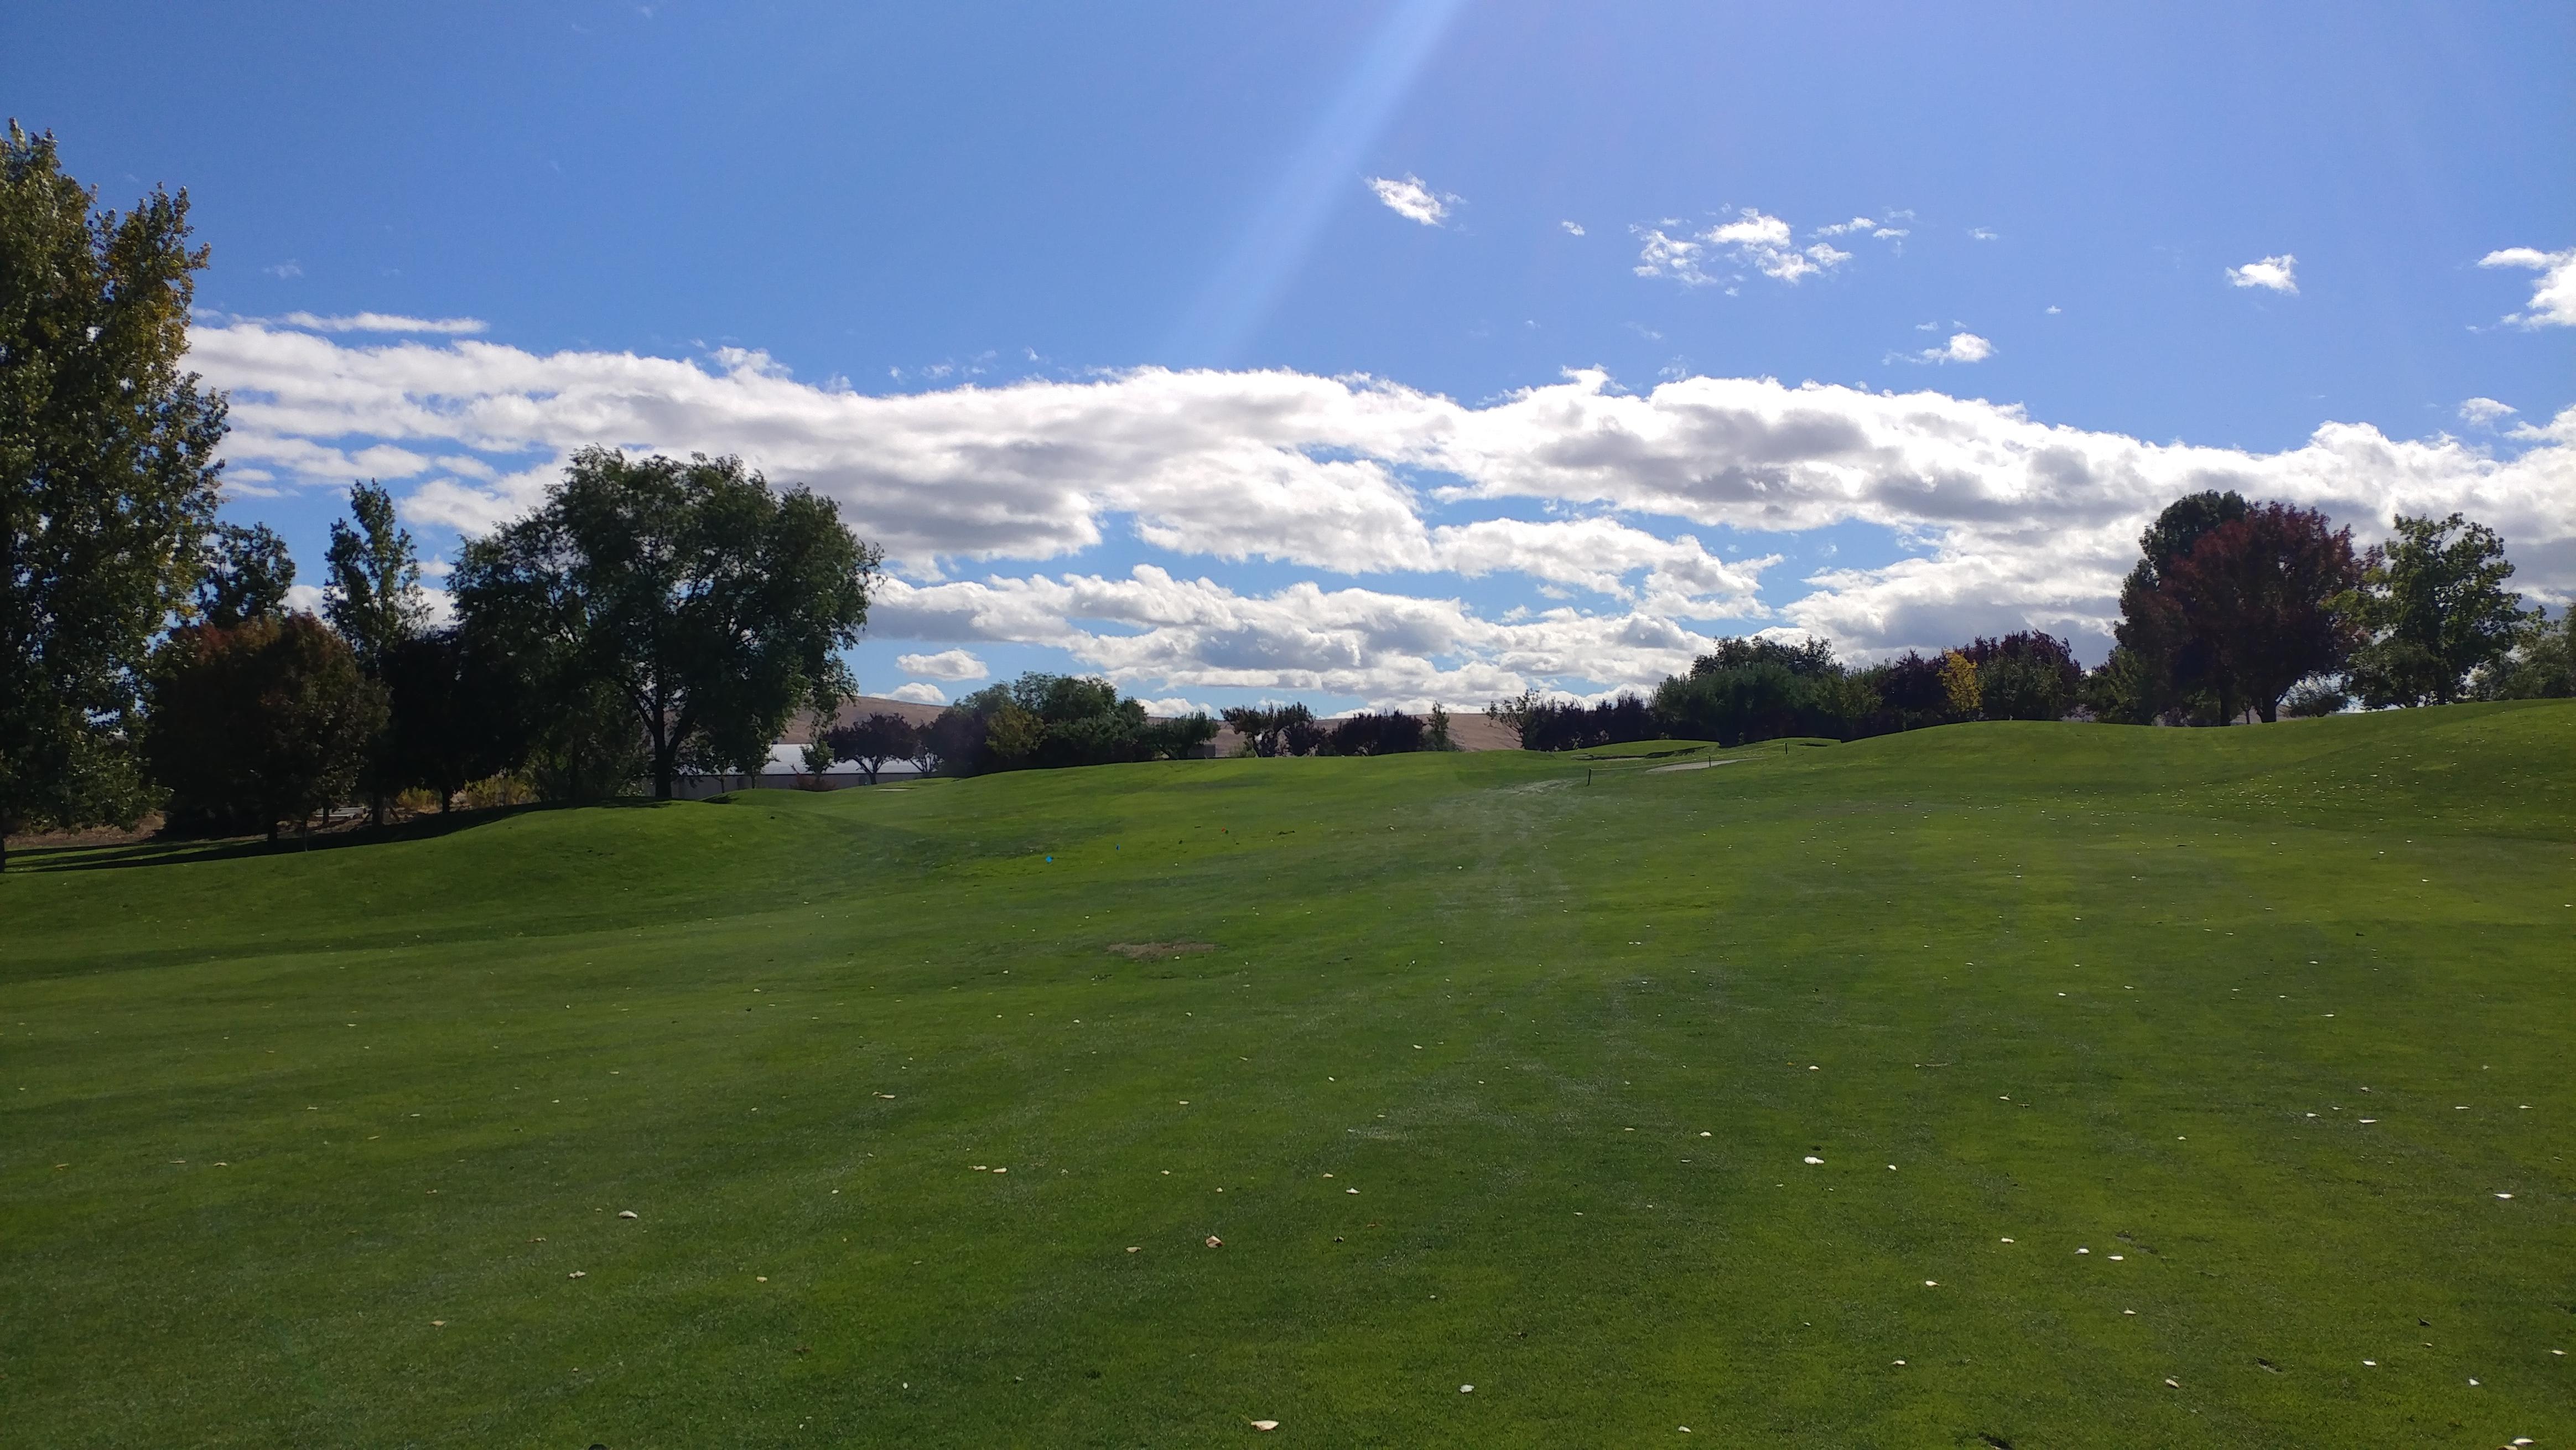 Apple Tree Golf Course Hole #1 - Approach - Saturday, September 30, 2017  (Yakima Trip)